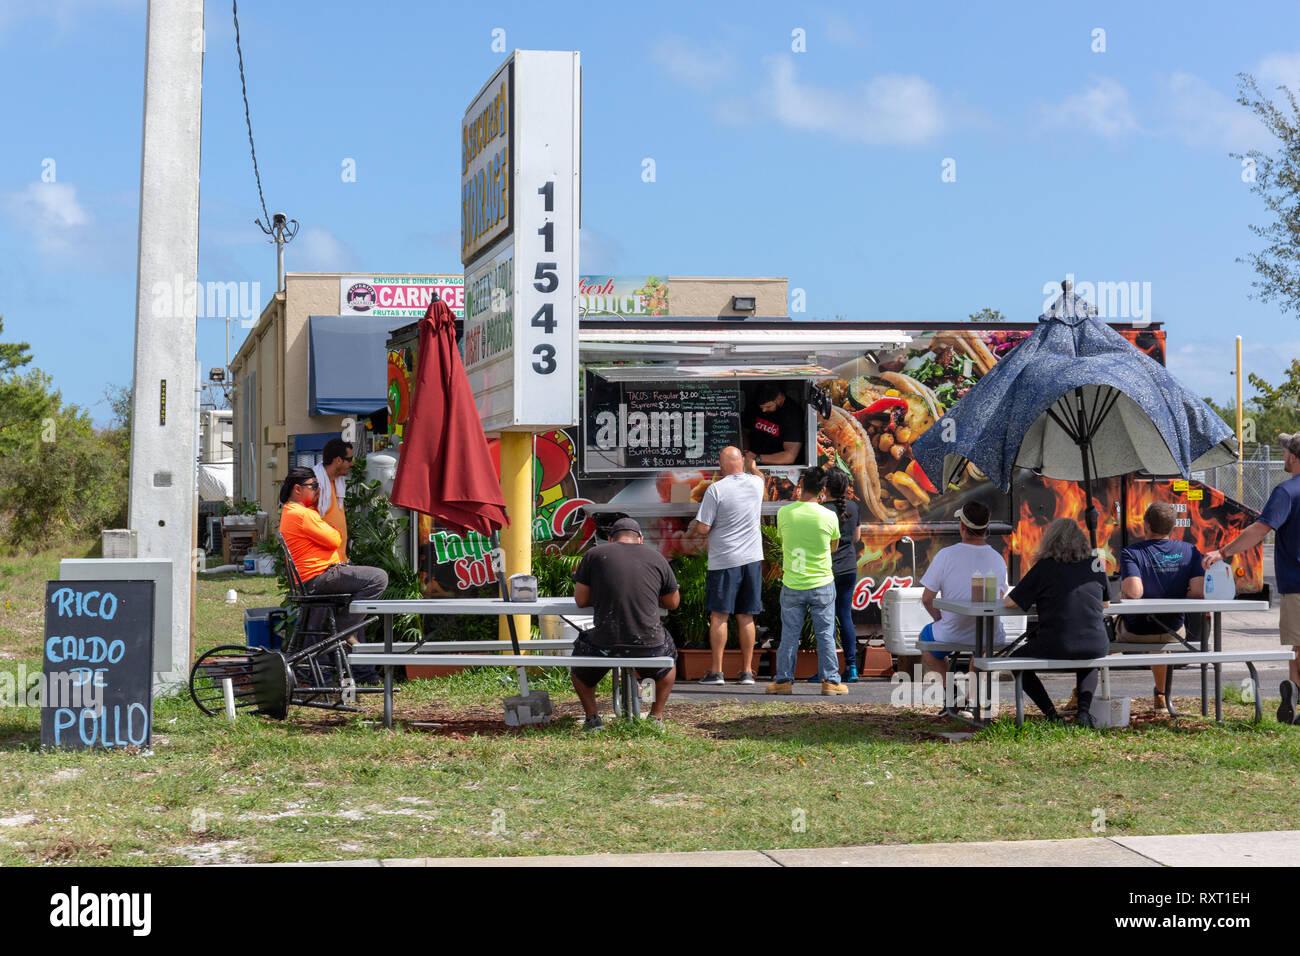 Taco sreet food van - Stock Image